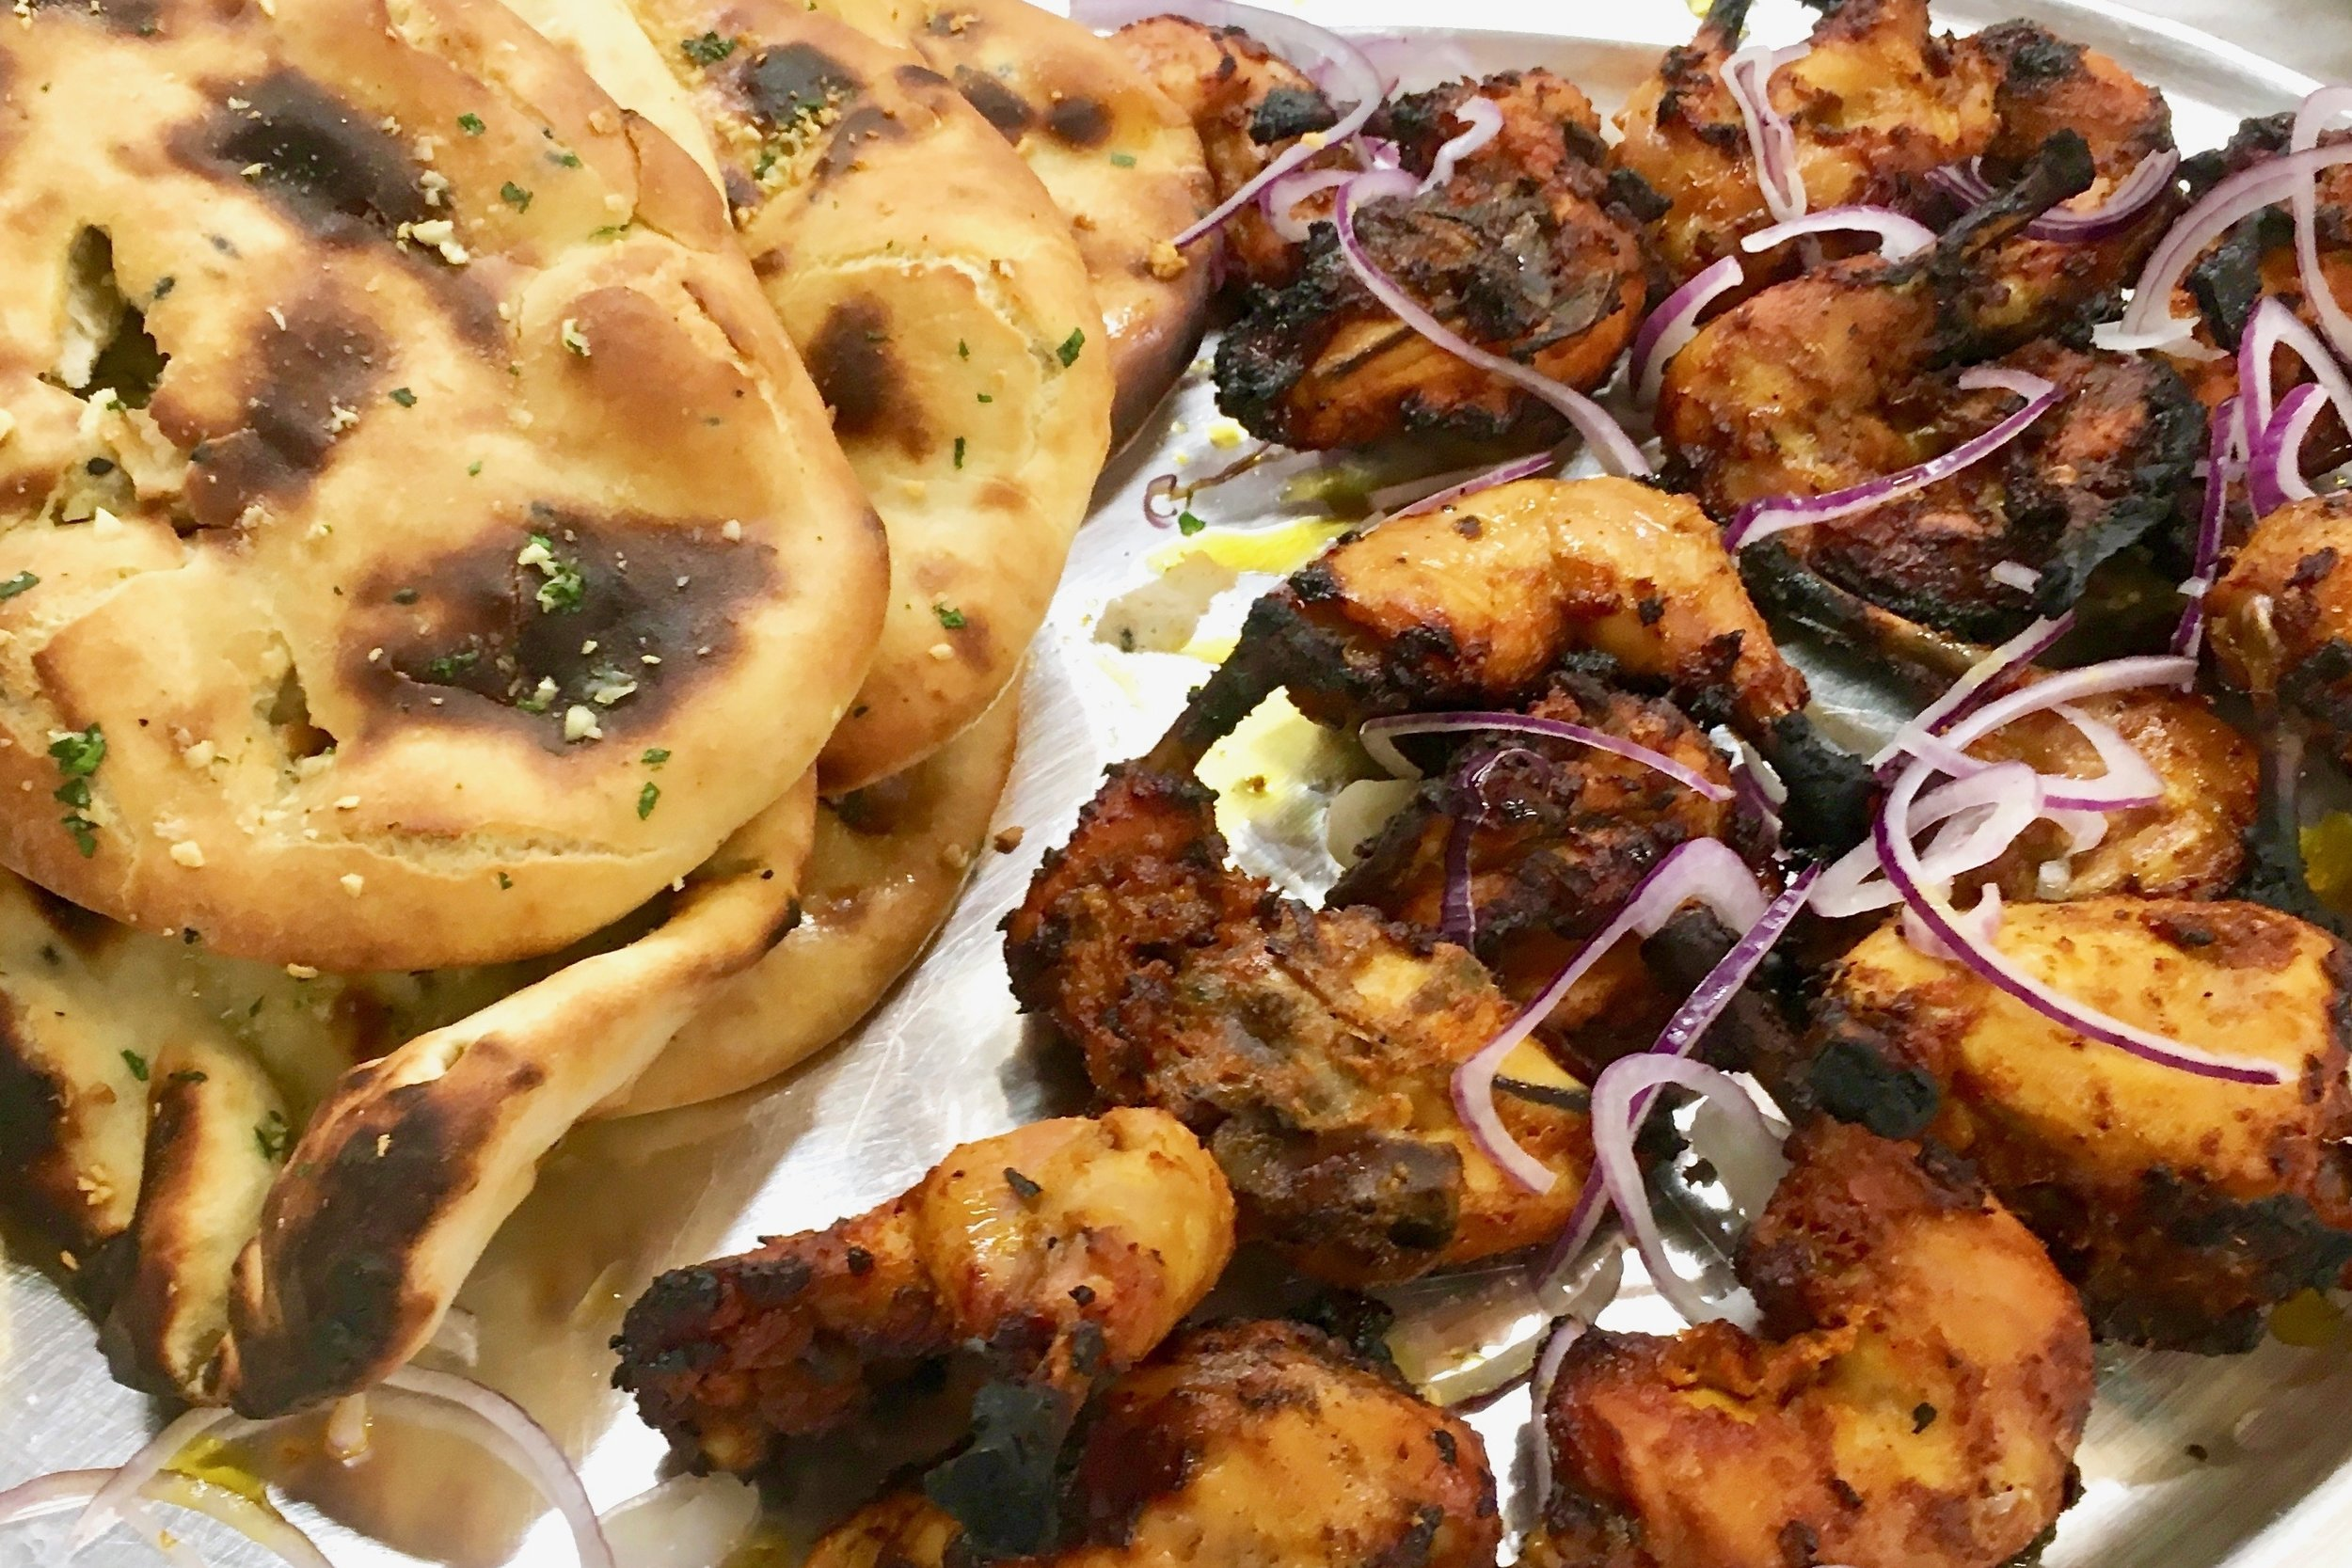 Tandoori chicken with naan bread